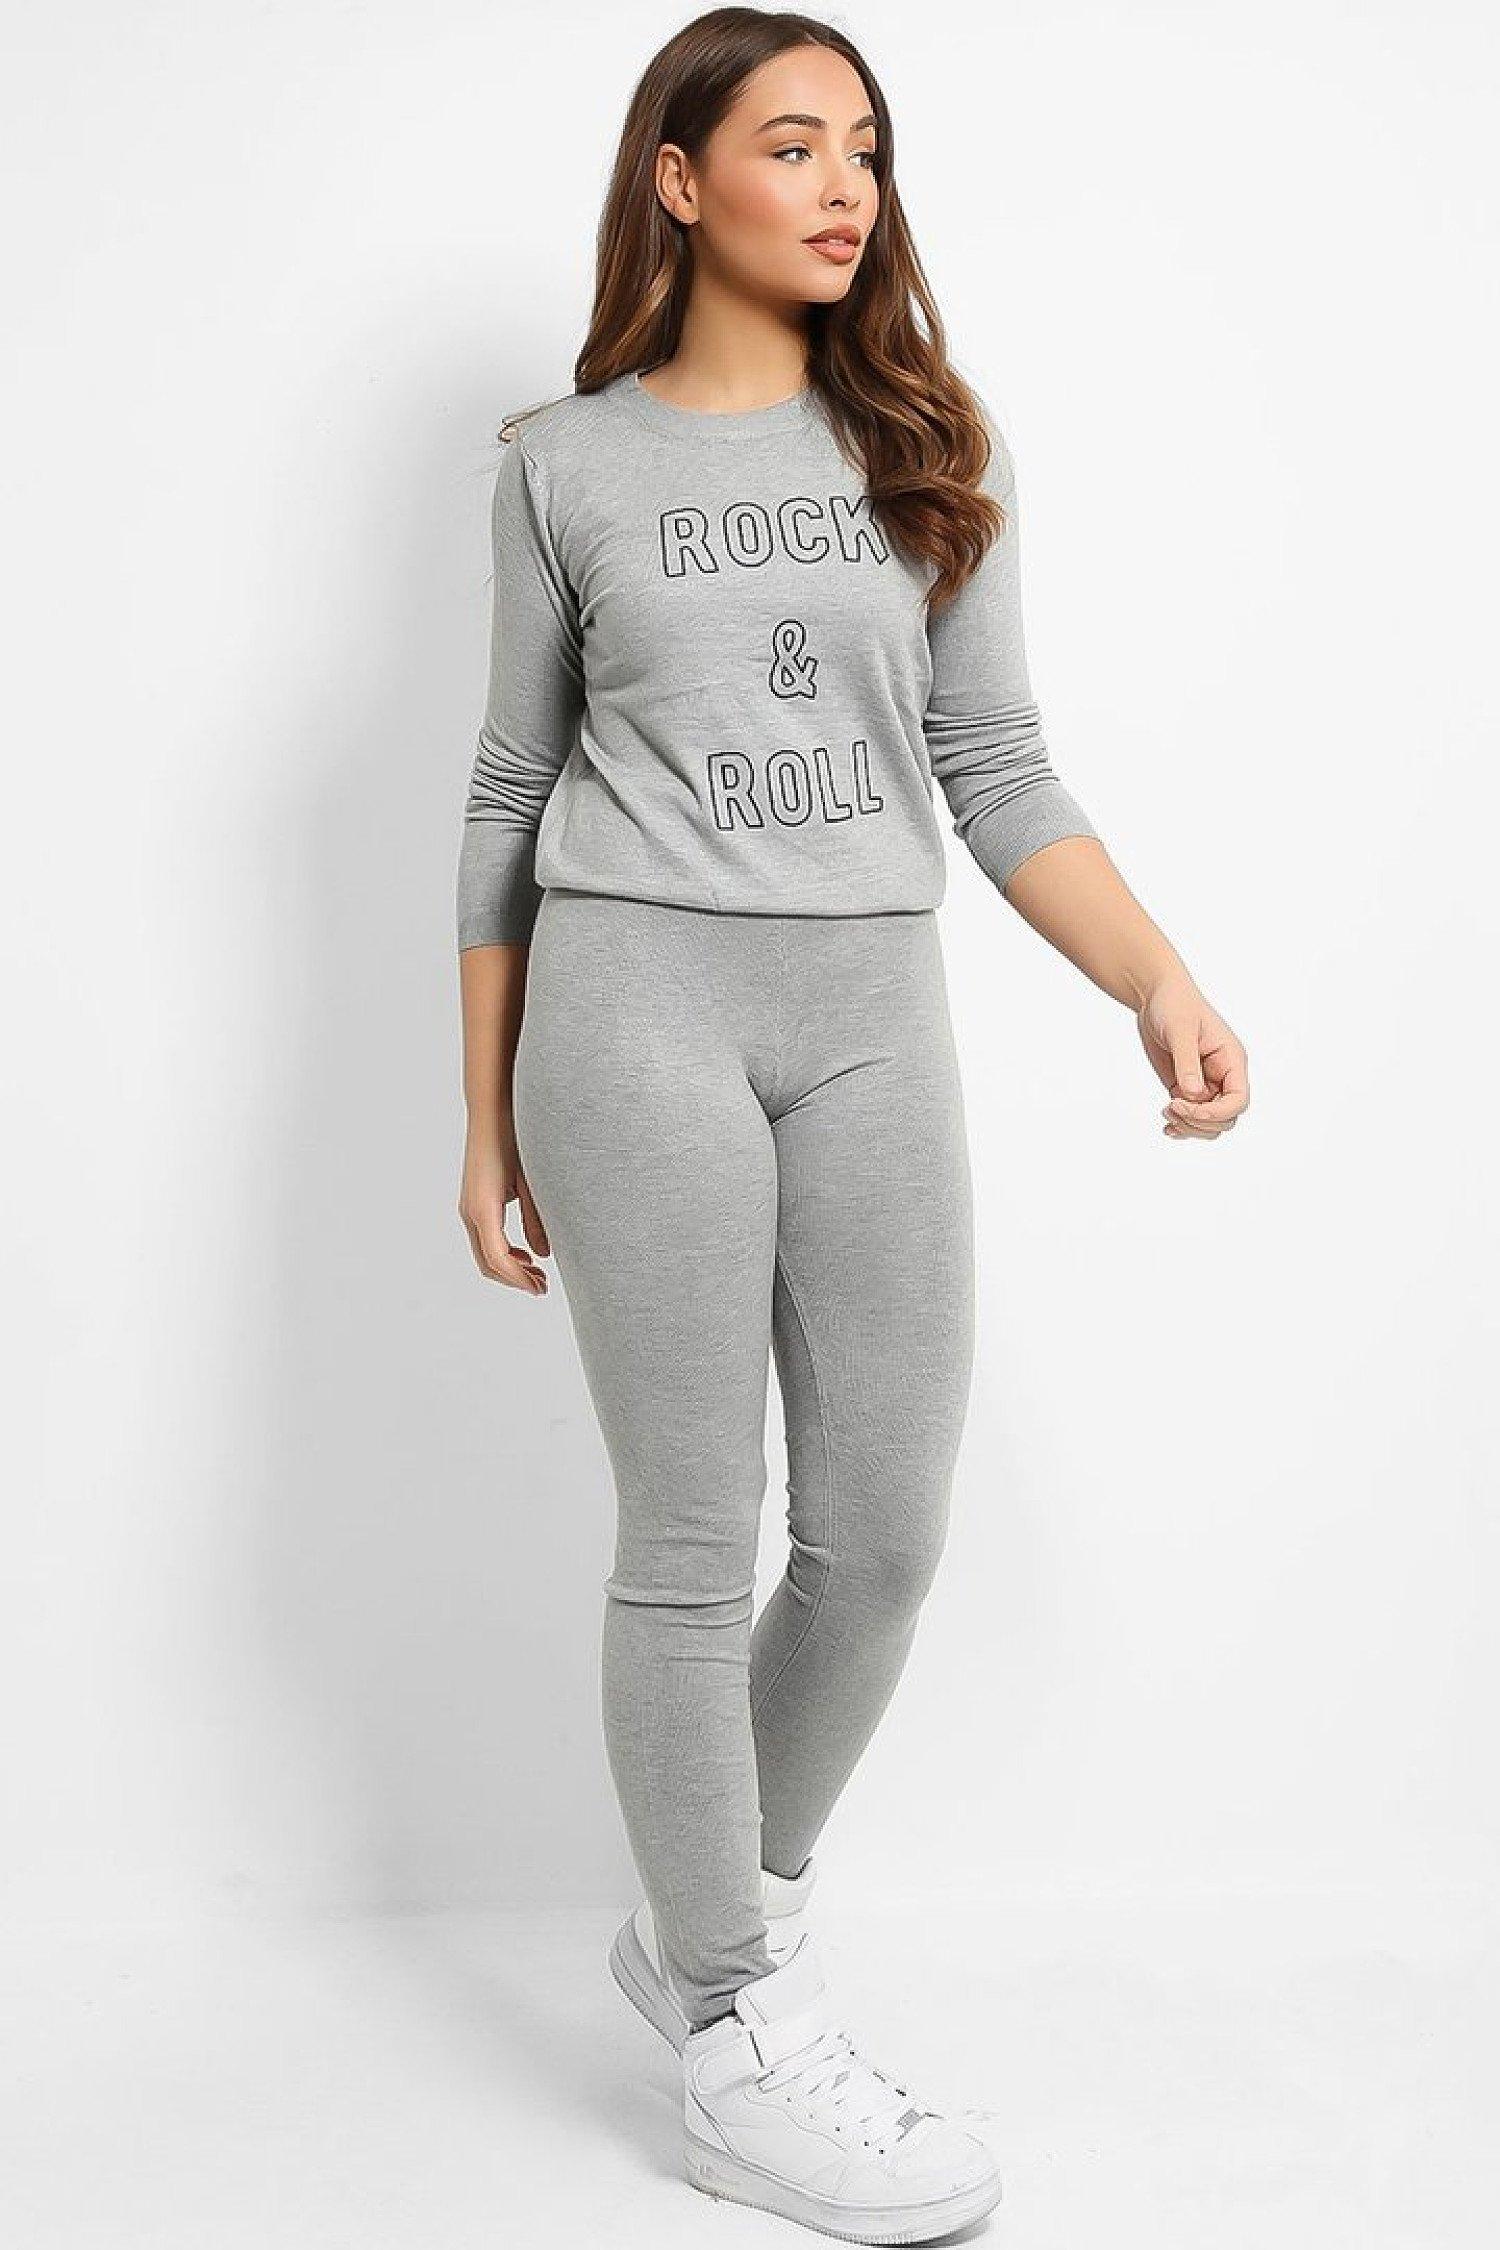 Grey Slogan Tracksuit One Size 8-14 Free Postage